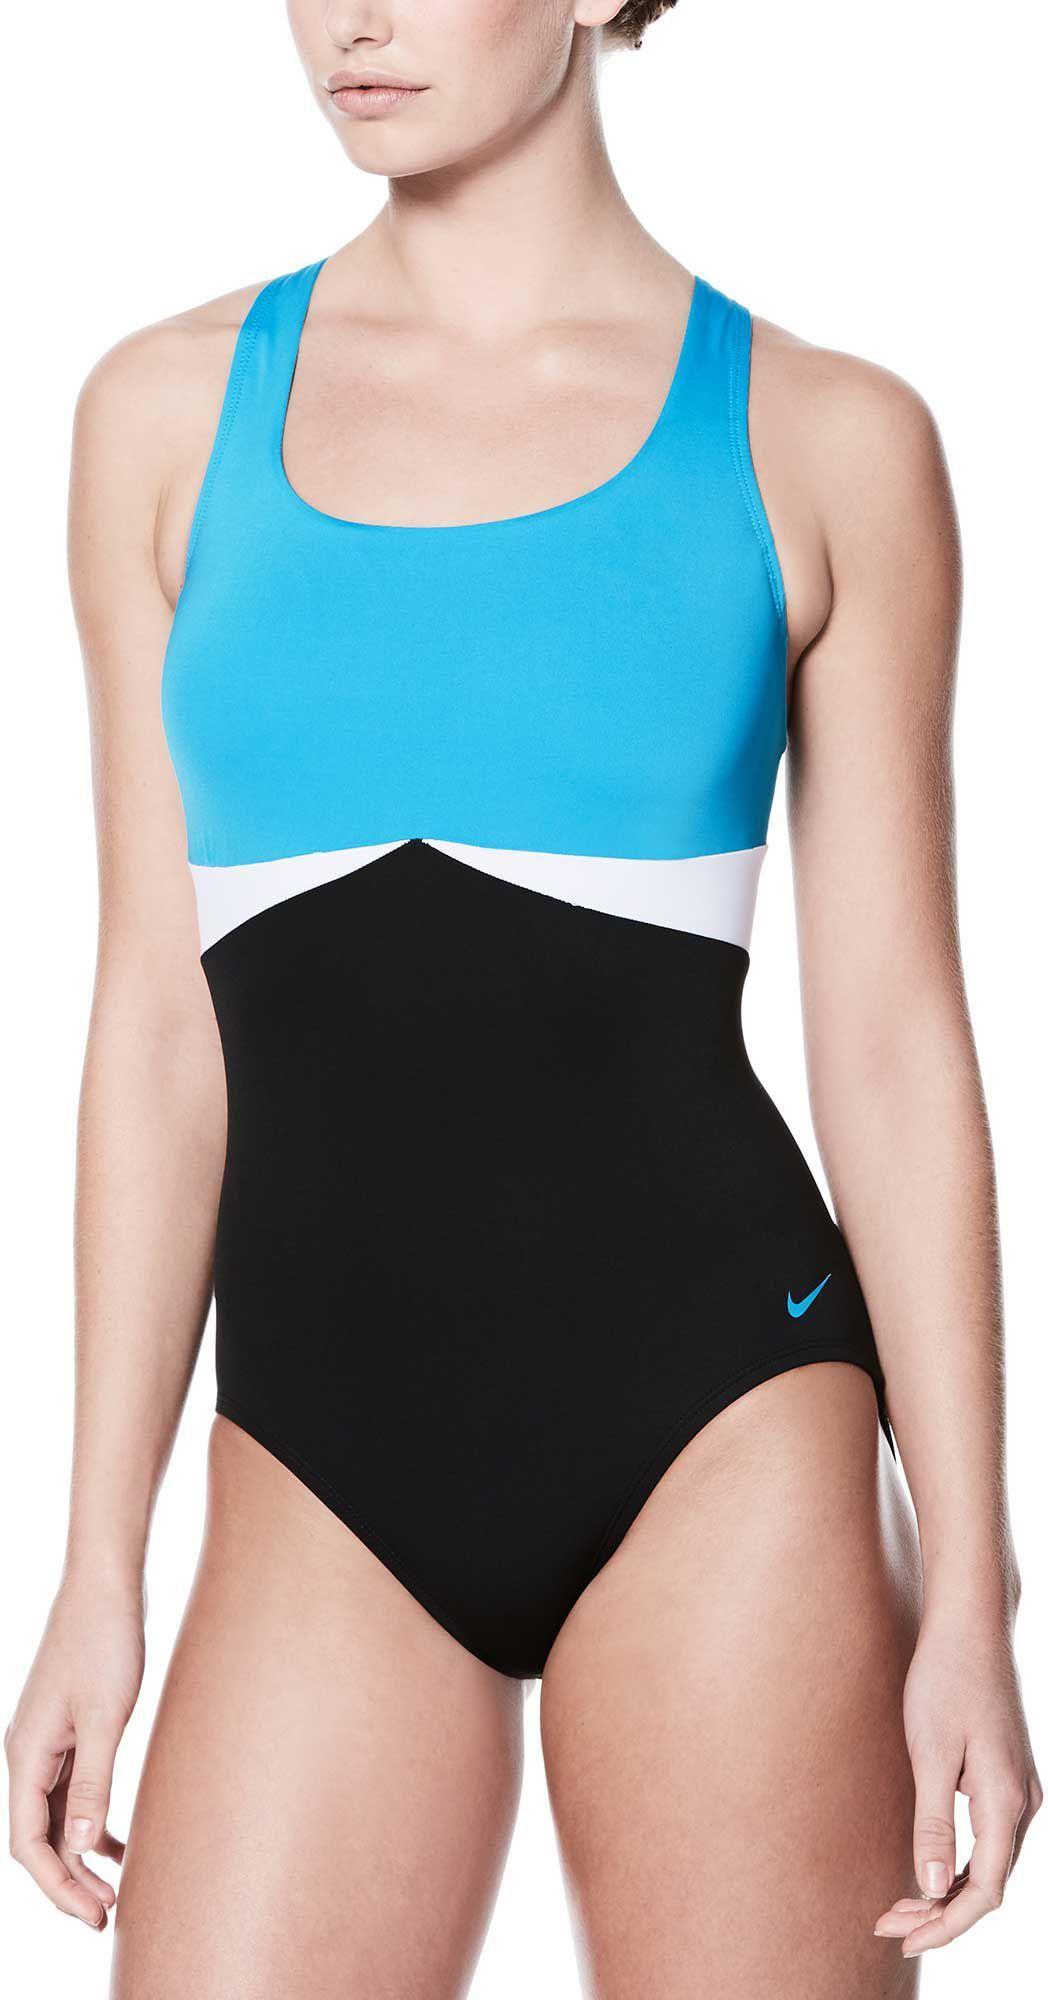 c66c5a6d35efd Nike Women's Color Surge Crossback Swimsuit | Products | Nike women ...